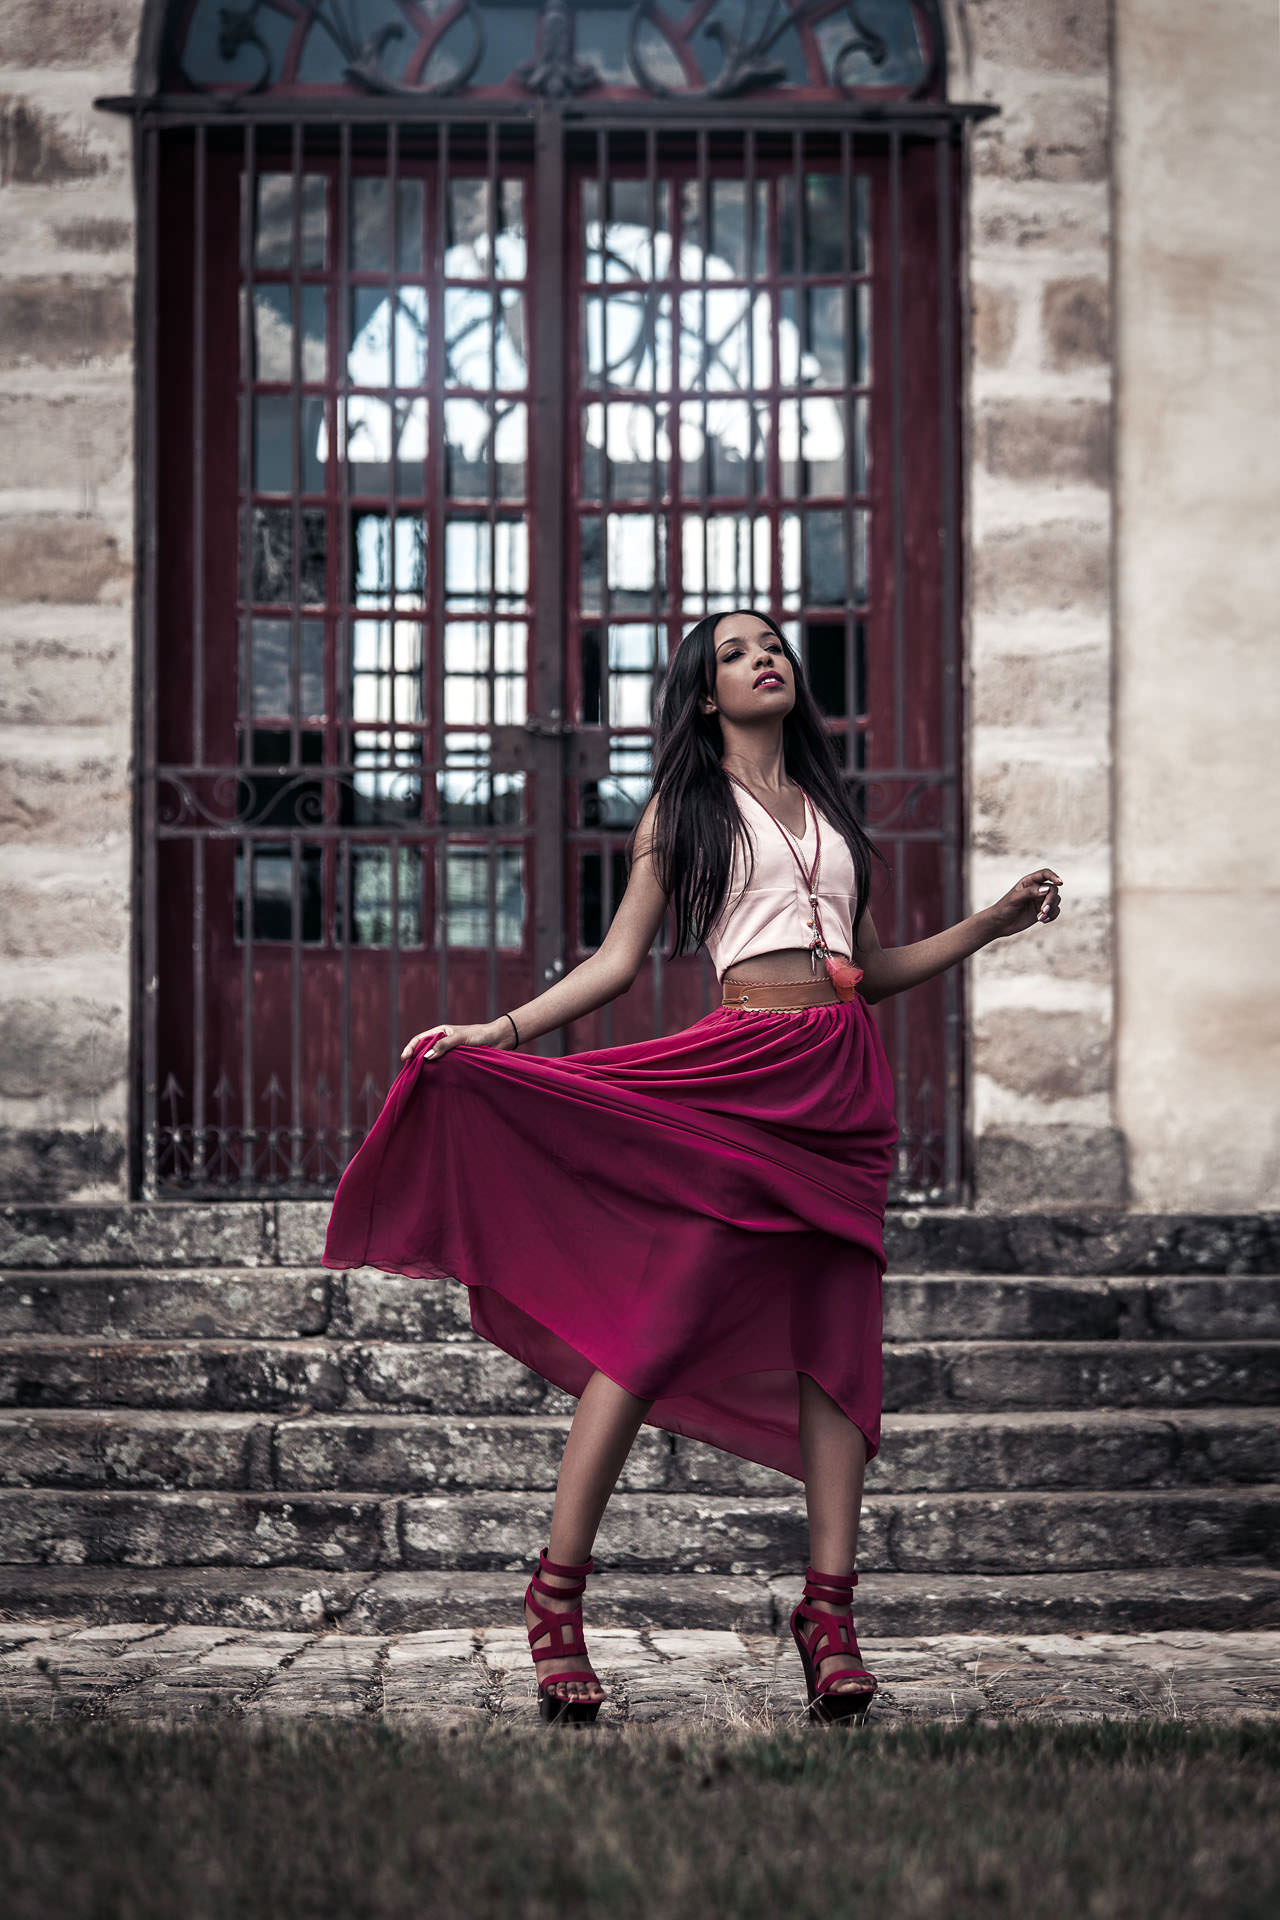 2015-08-21 - Imene Pauloin - Chateau Mesnil Voysin - 6985 - 1920px